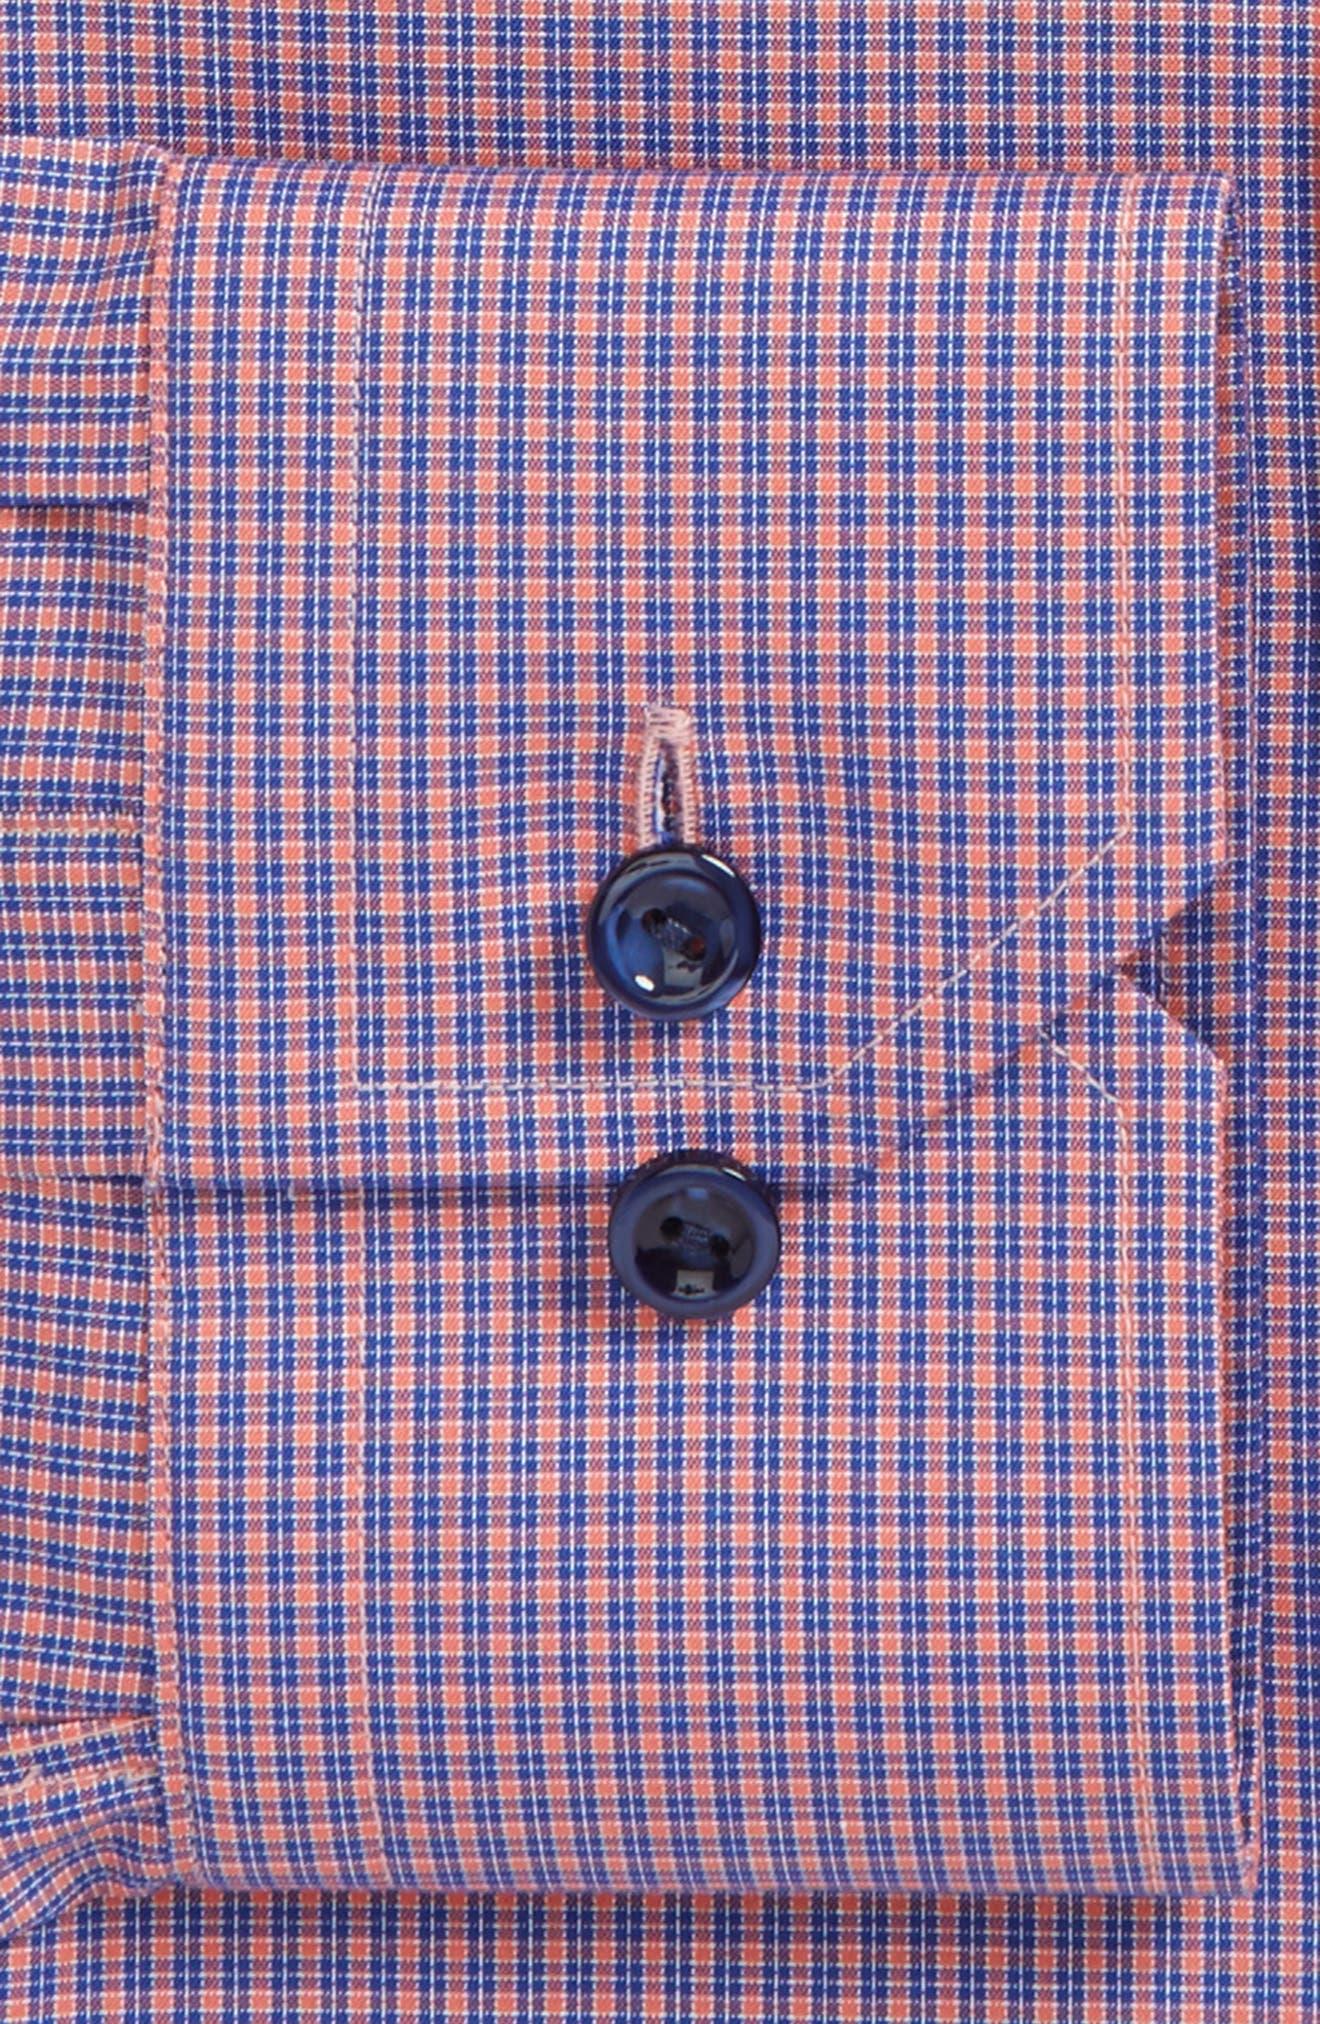 Slim Fit Check Dress Shirt,                             Alternate thumbnail 2, color,                             600